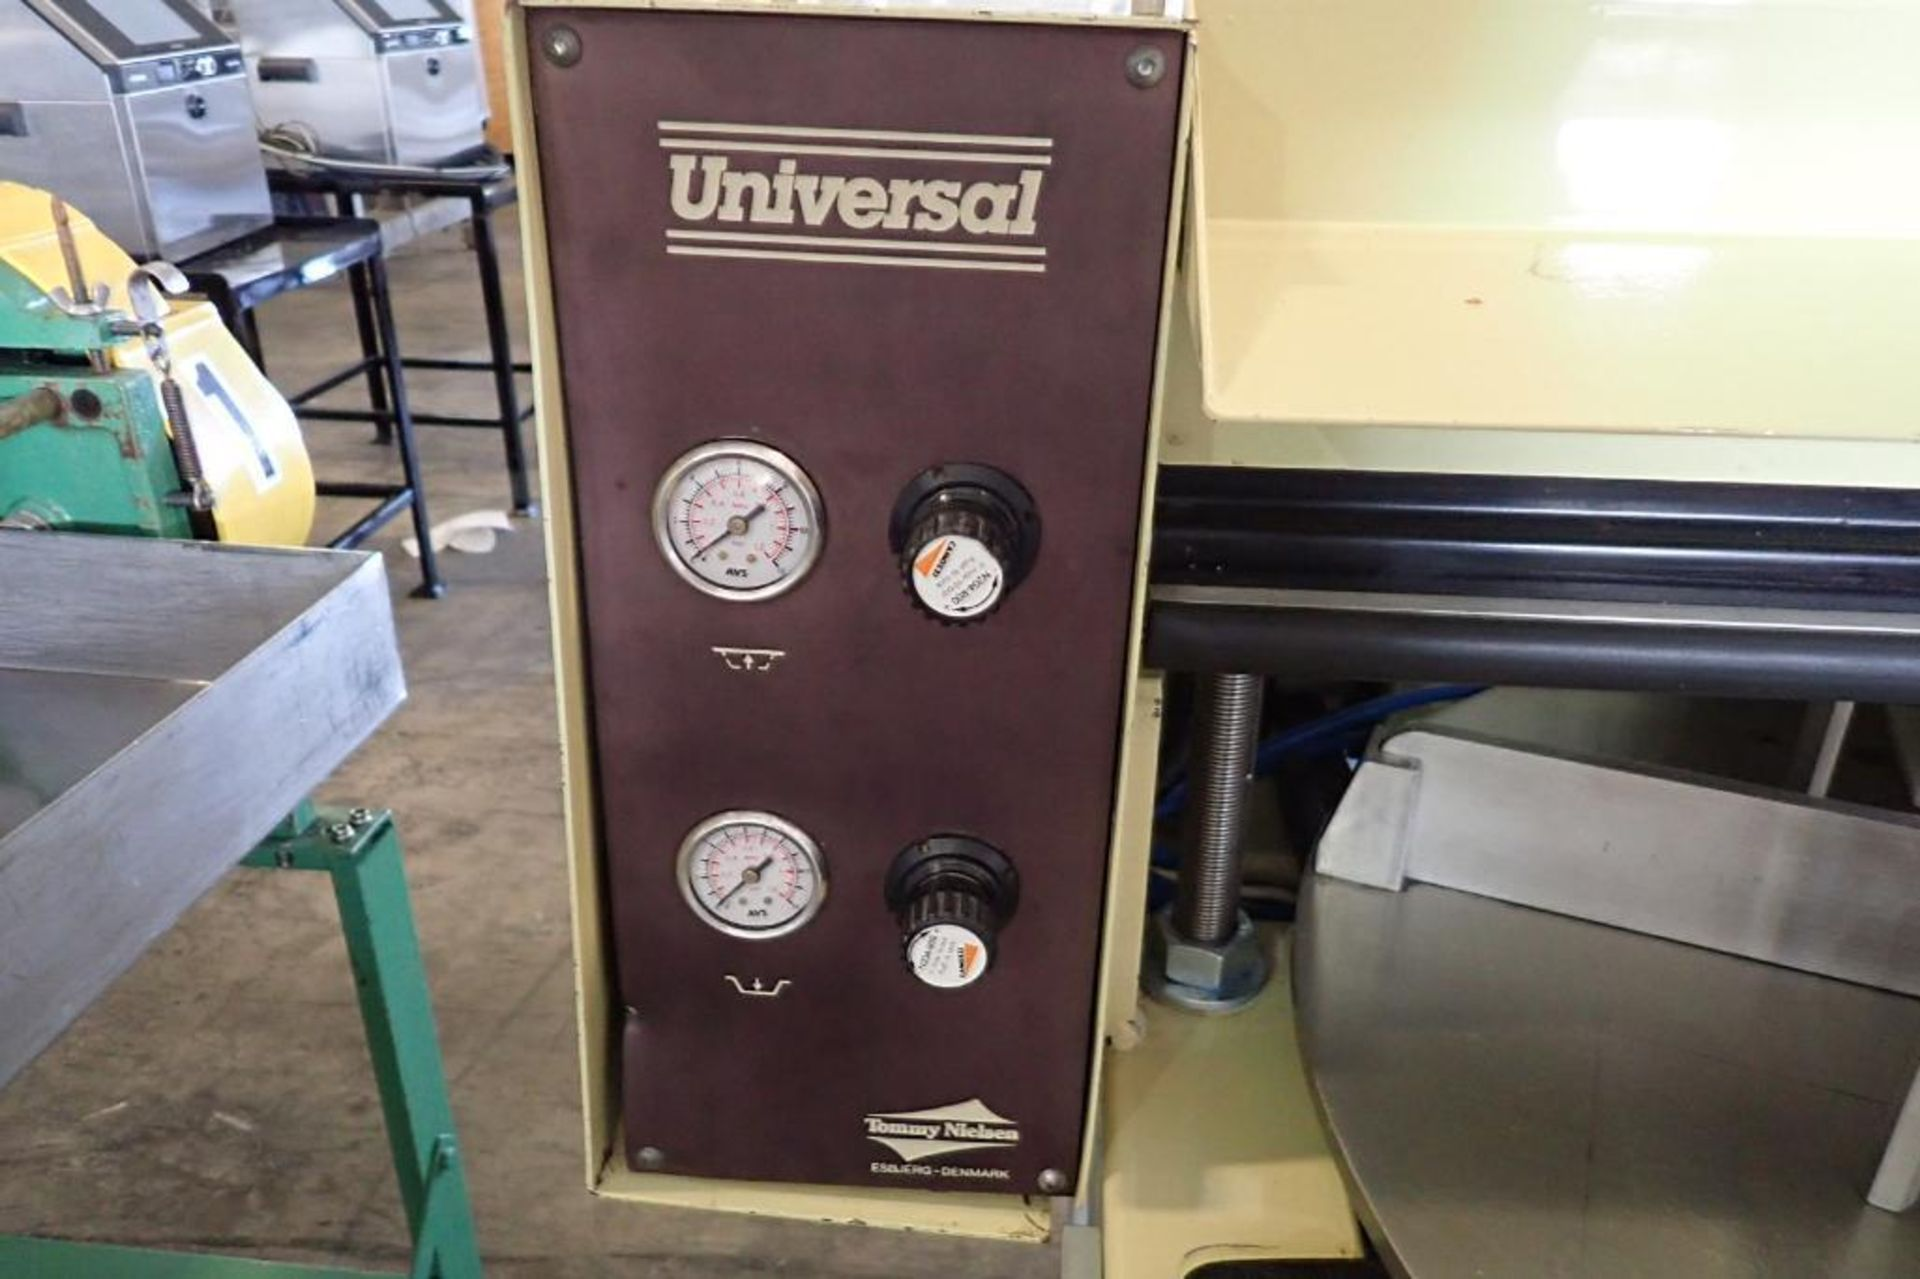 Lot 48 - 2005 Tommy Nielsen manual feed sealer, Model Universal 300FS, SN 880427 { Rigging Fee: $25}